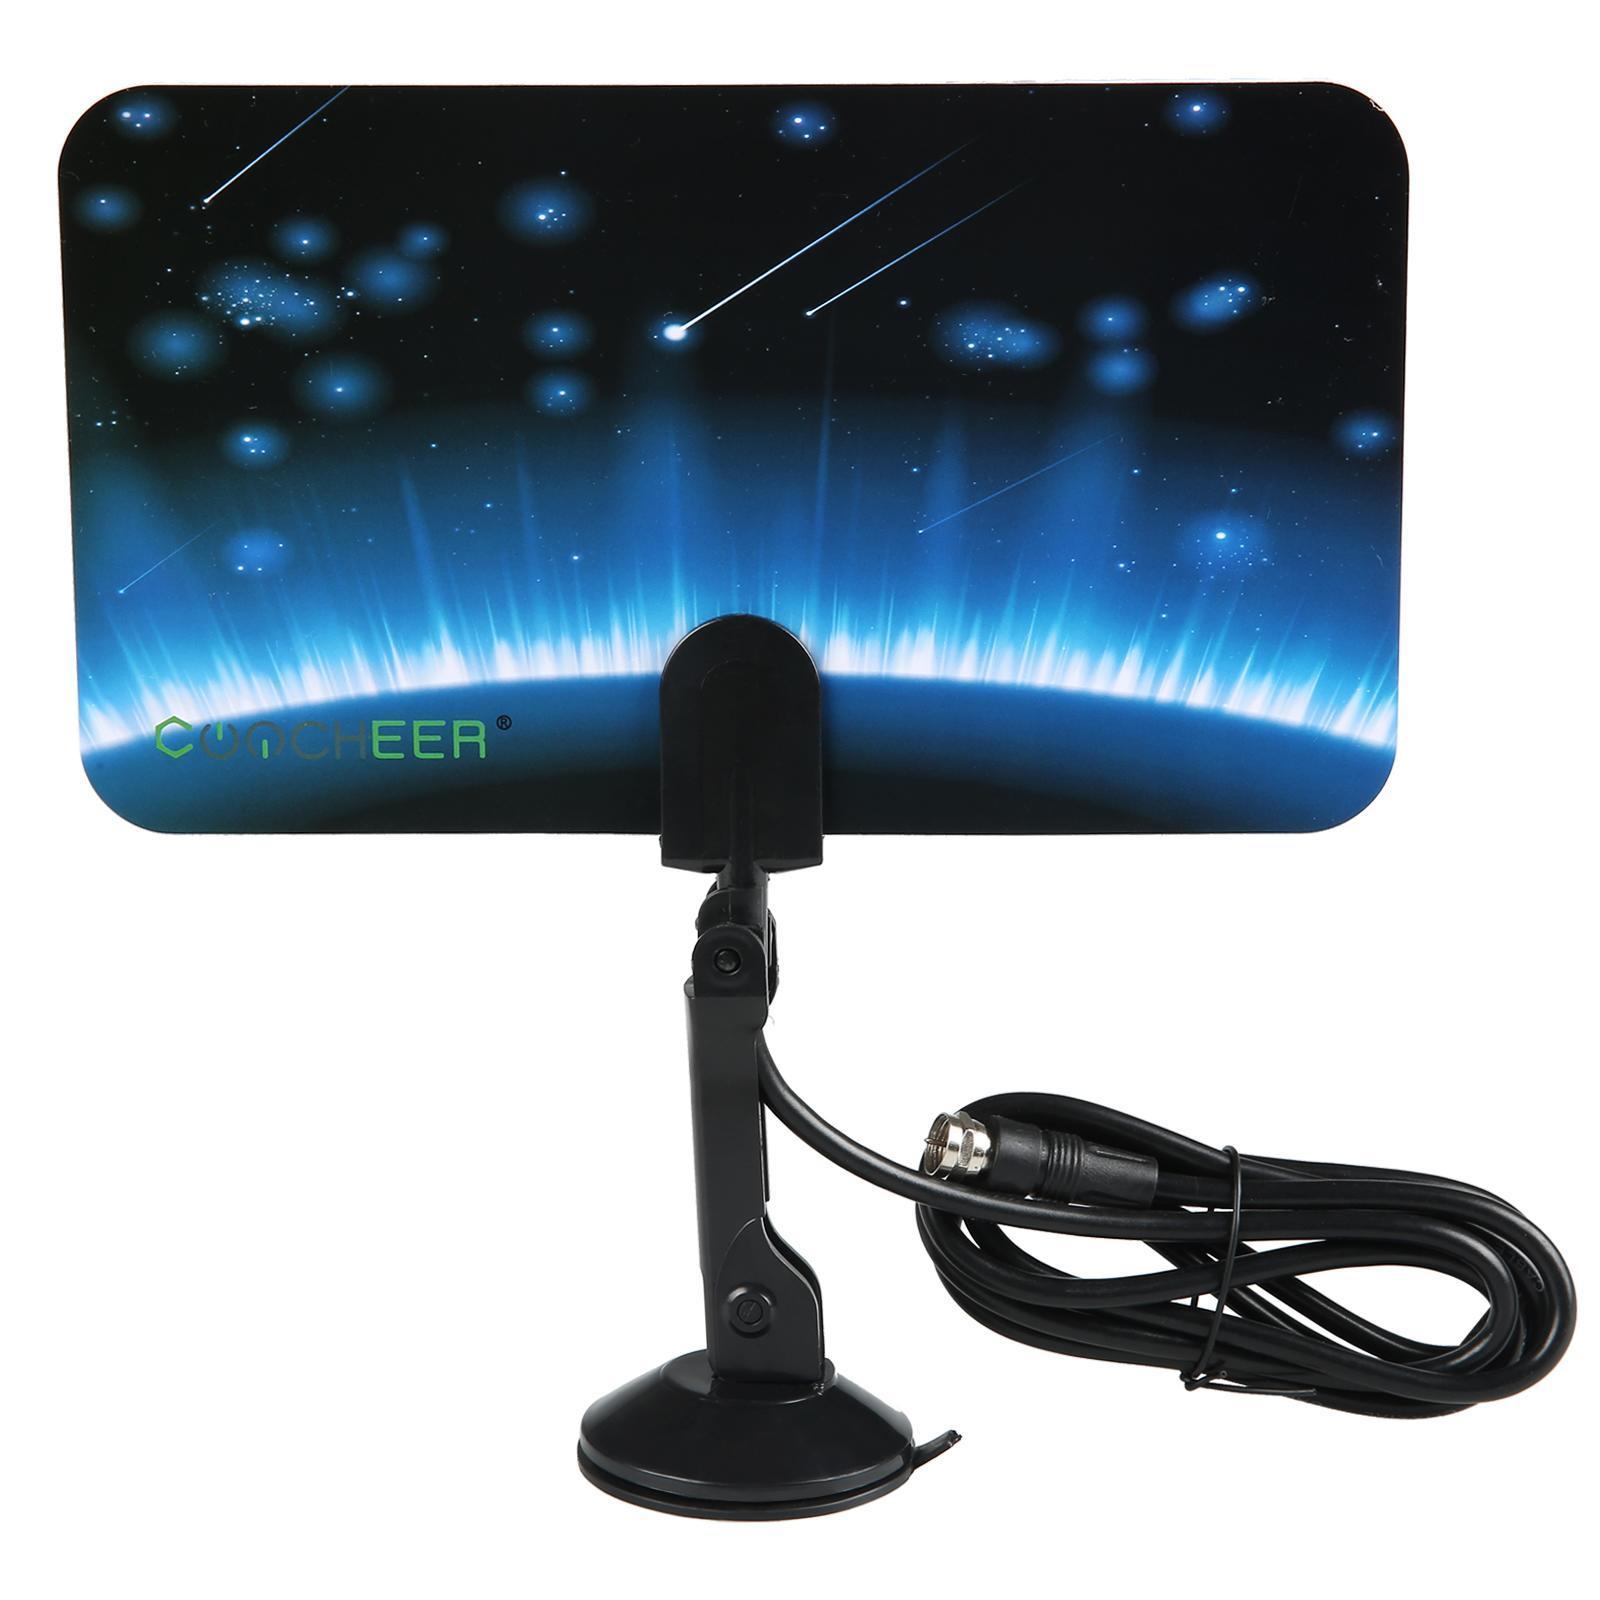 Digital TV Antenna Signal HDTV DTV Box Ready HD VHF UHF FM Stereo Flat Design 0